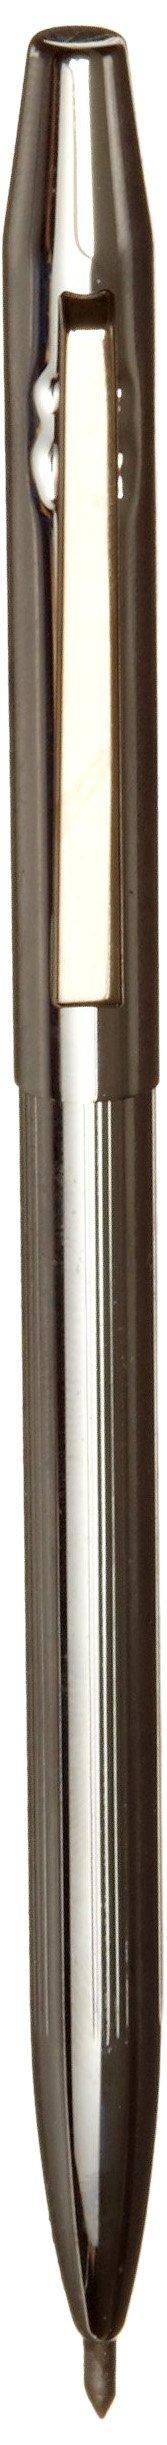 Brown & Sharpe 599-776 Combination Scriber/Magnet